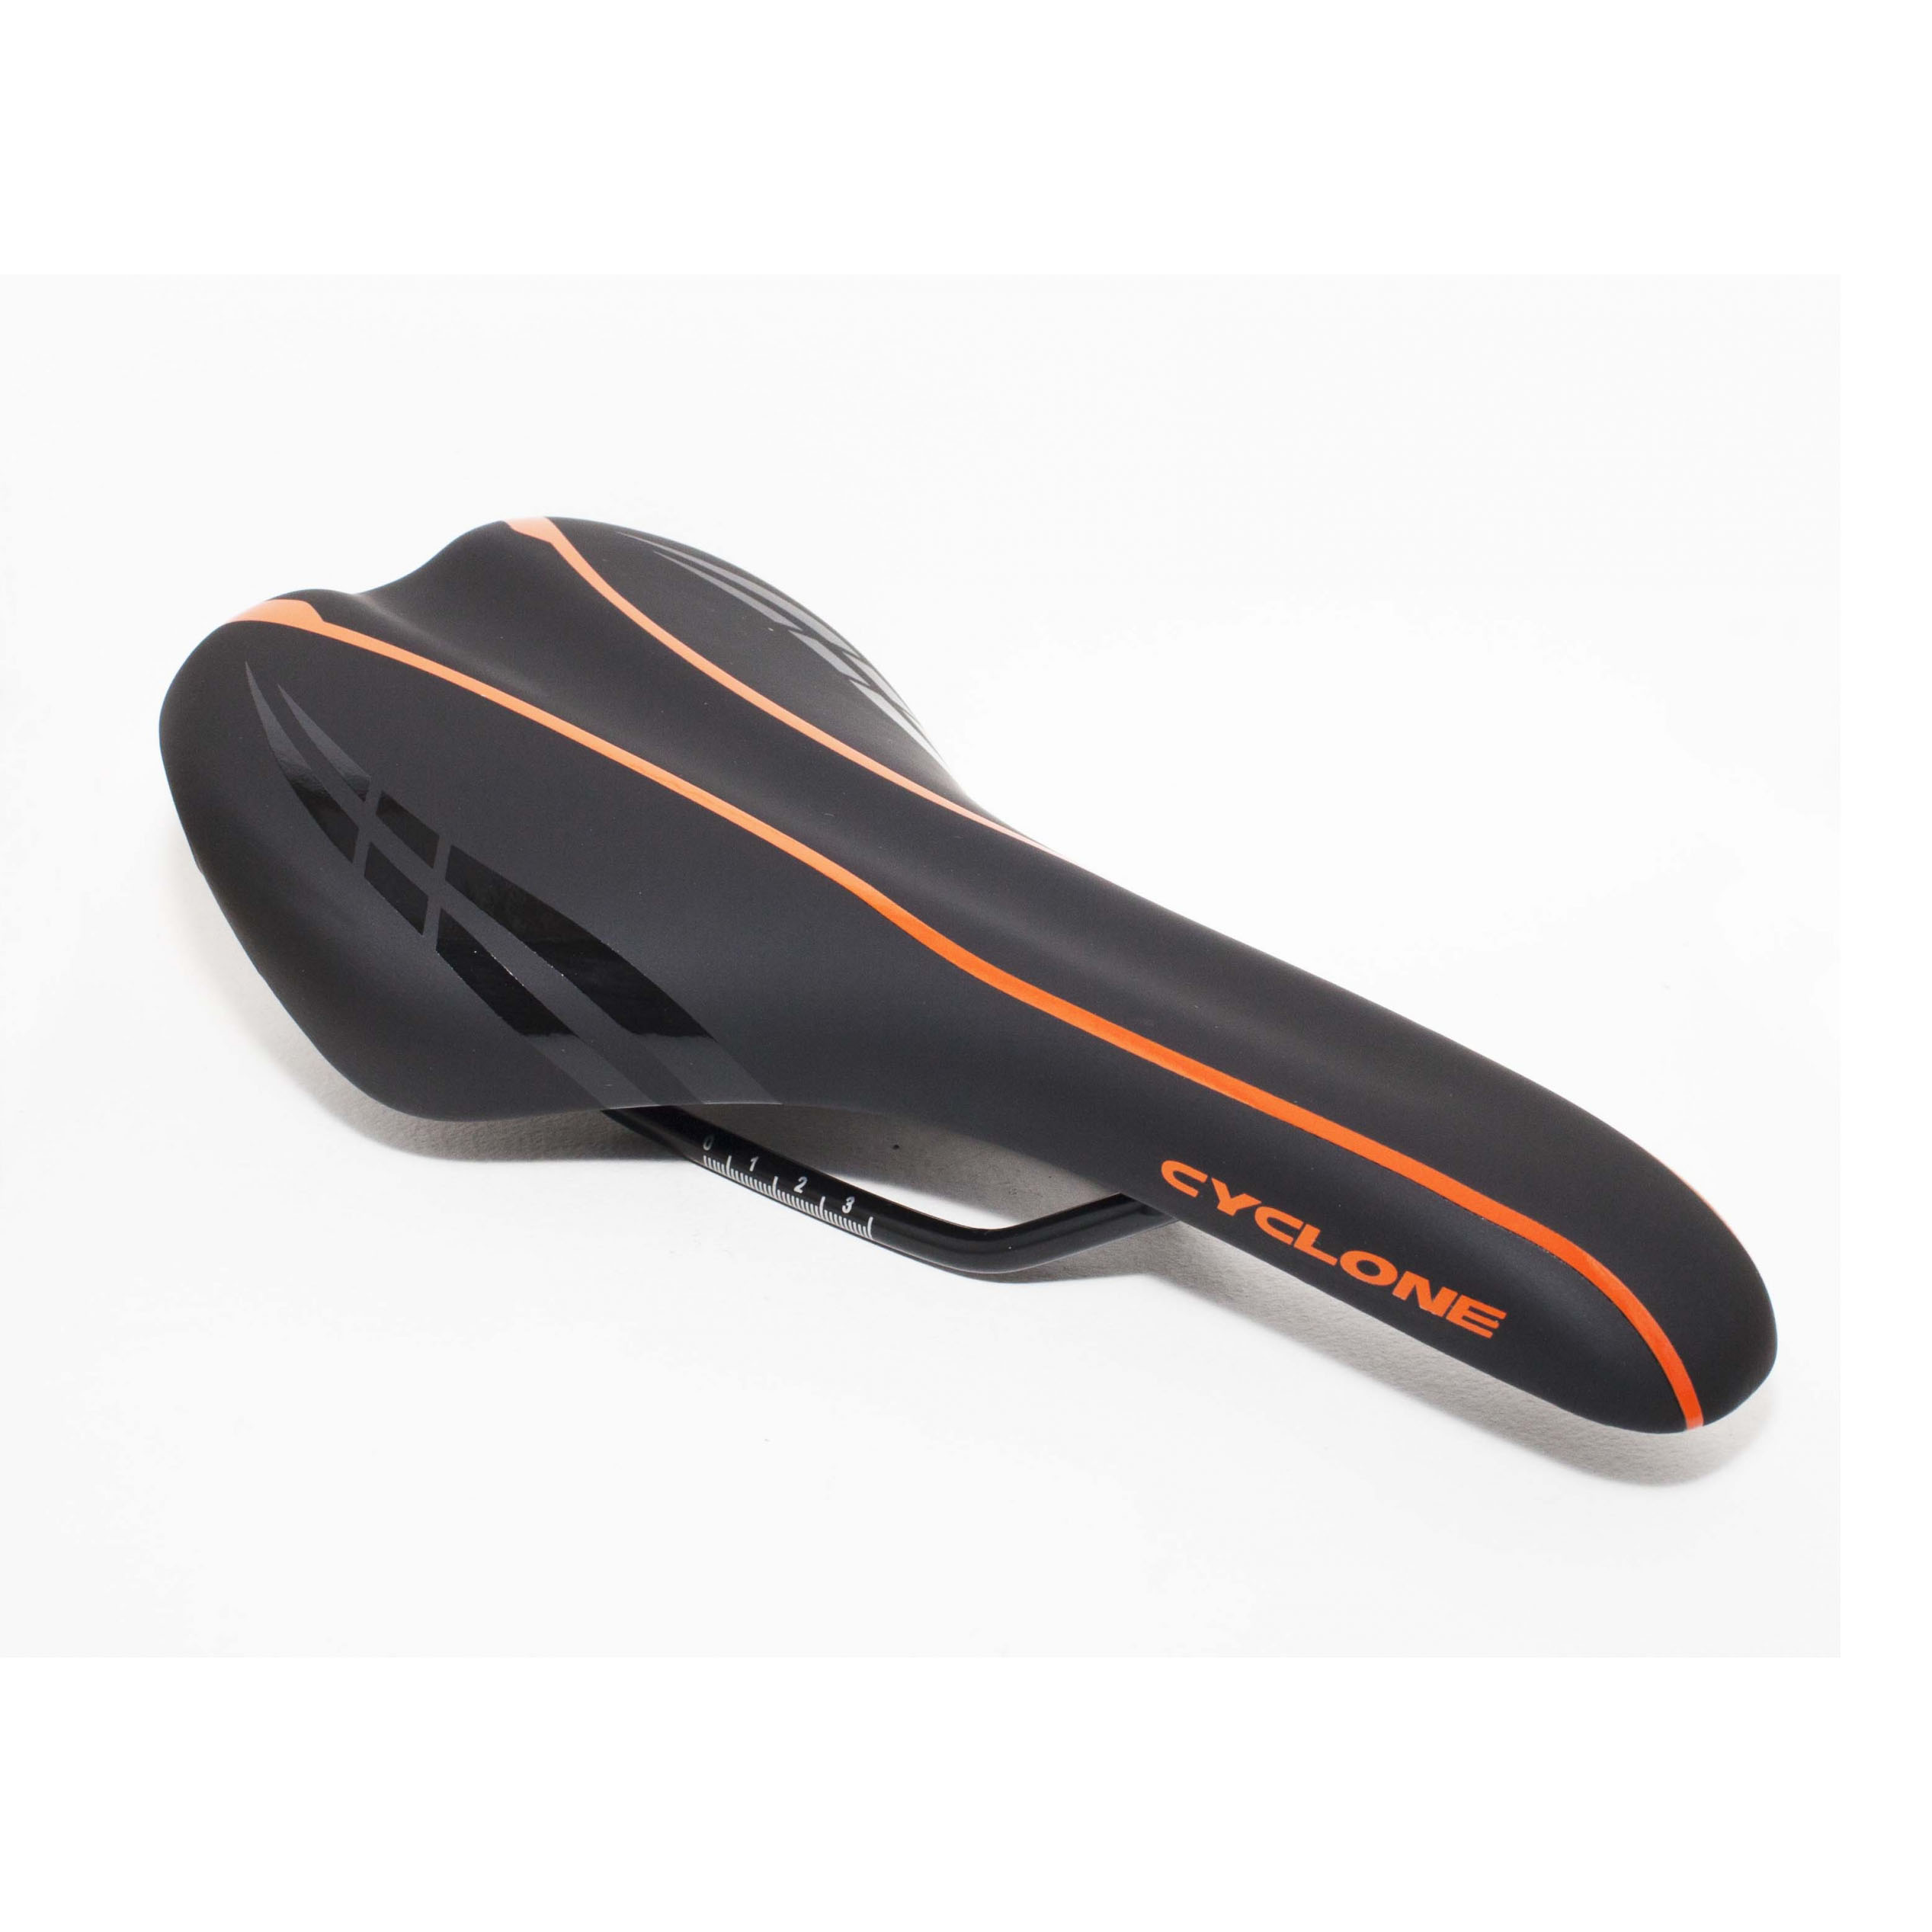 Фото Седло Selle Royal 2065URN лого Сyclone чёрно-оранжевое